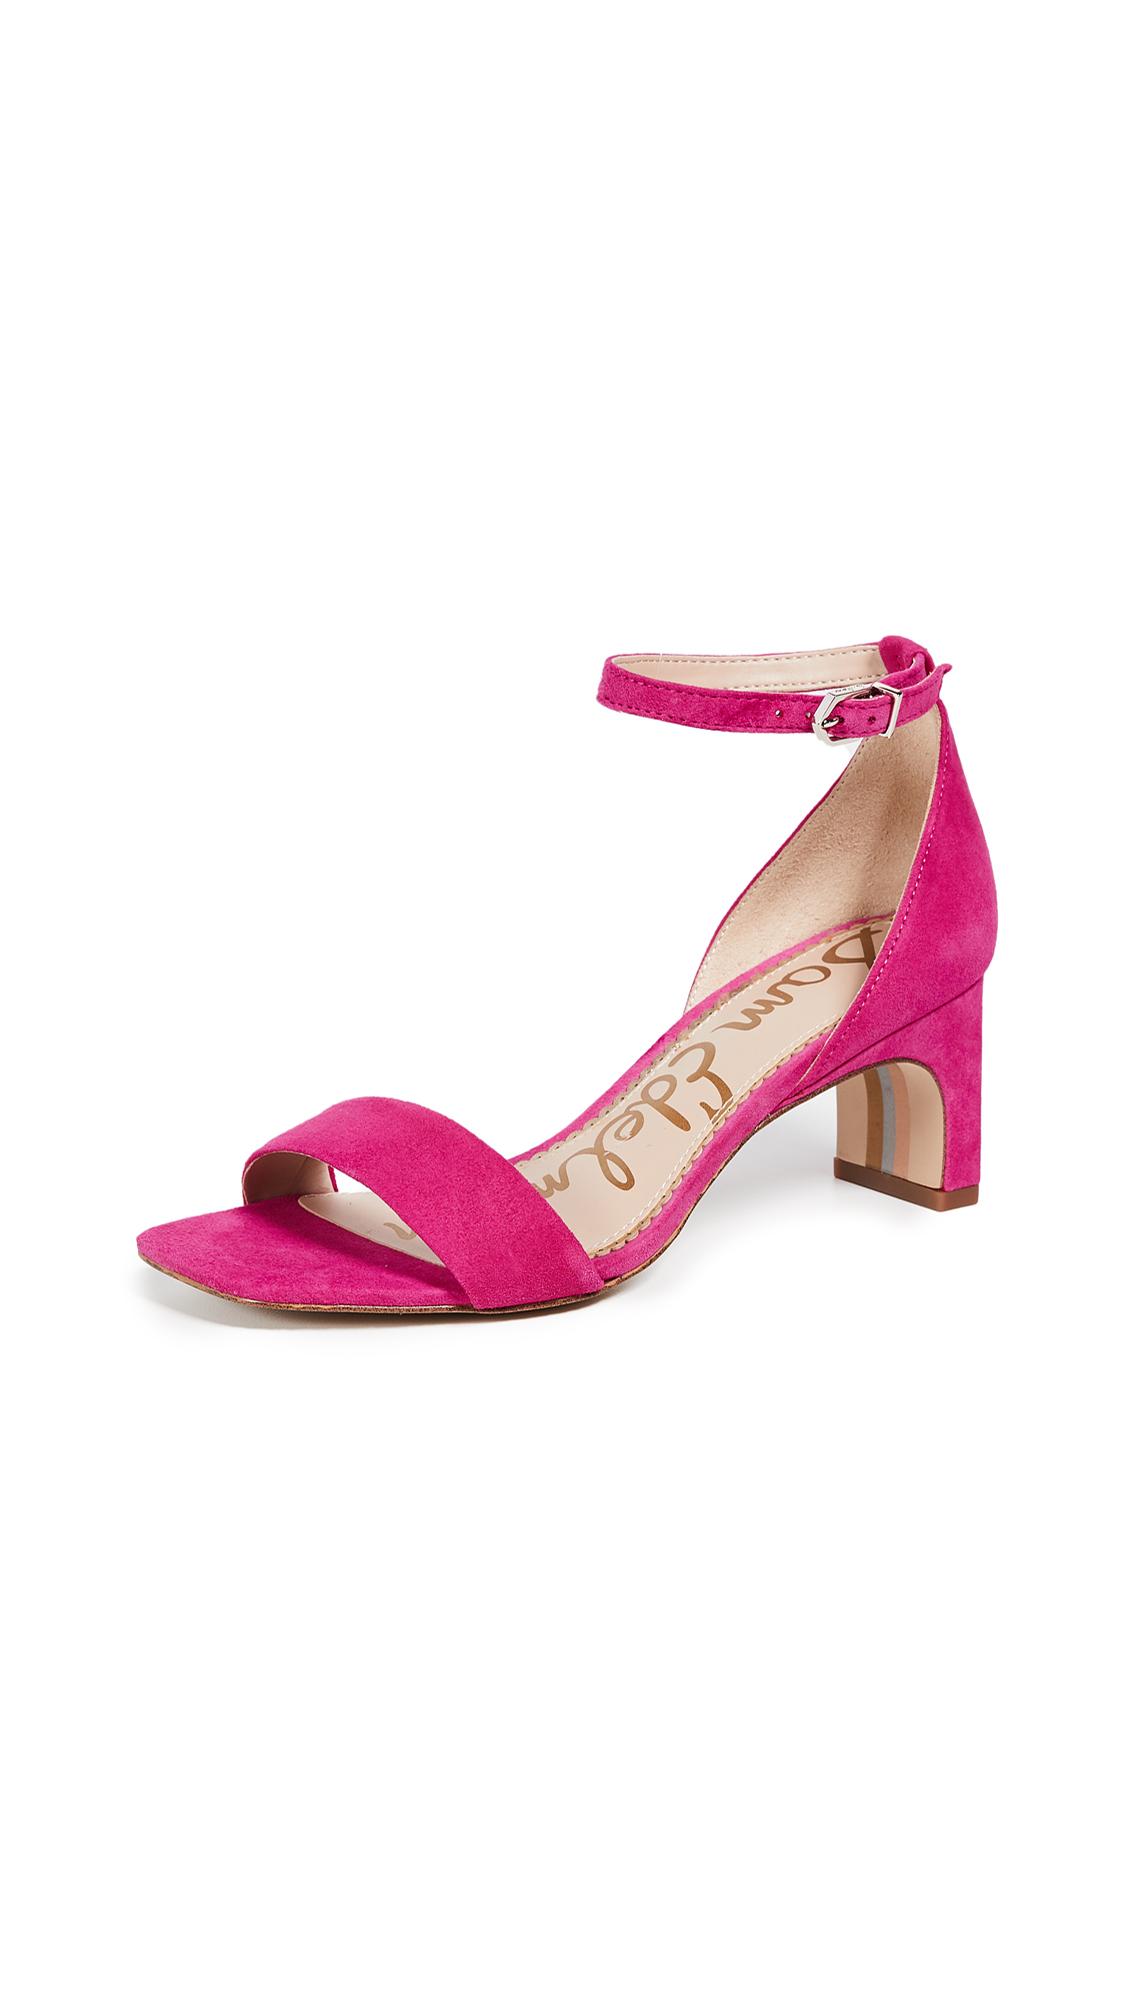 Sam Edelman Holmes Sandals - Pink Peony